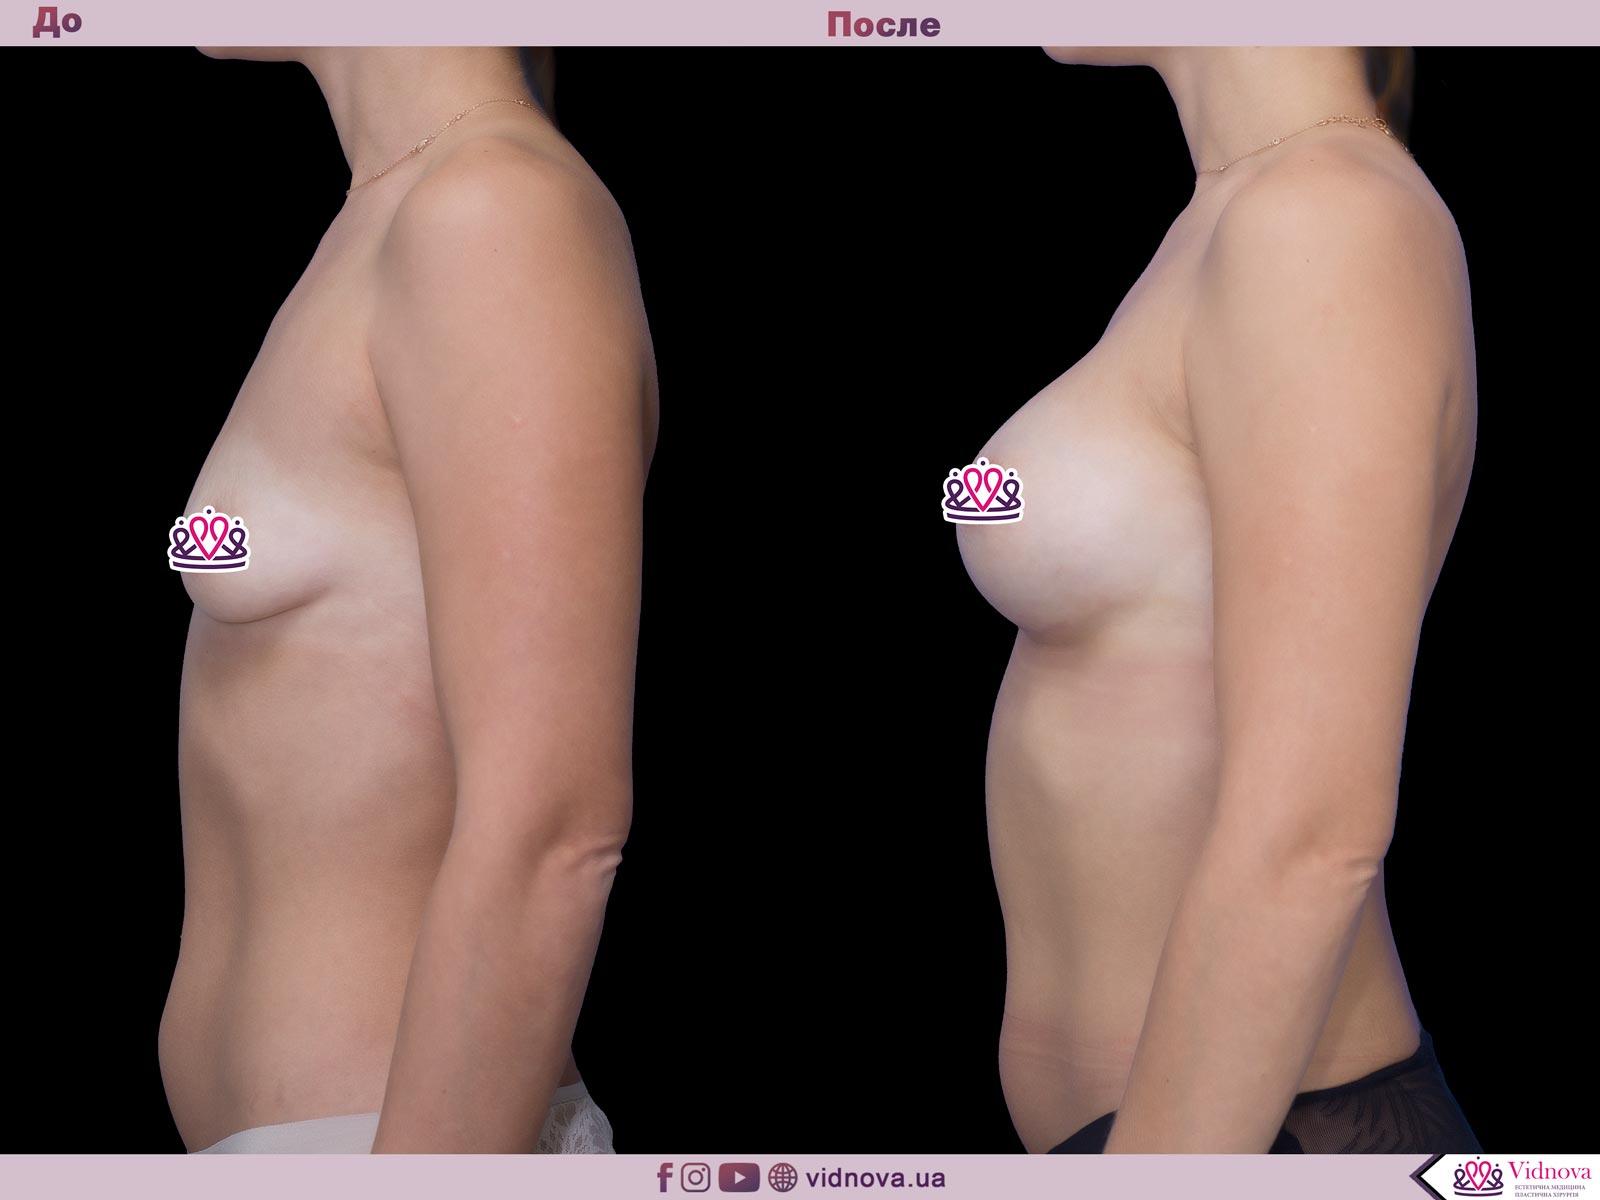 Увеличение груди: Фото ДО и ПОСЛЕ - Пример №49-3 - Клиника Vidnova